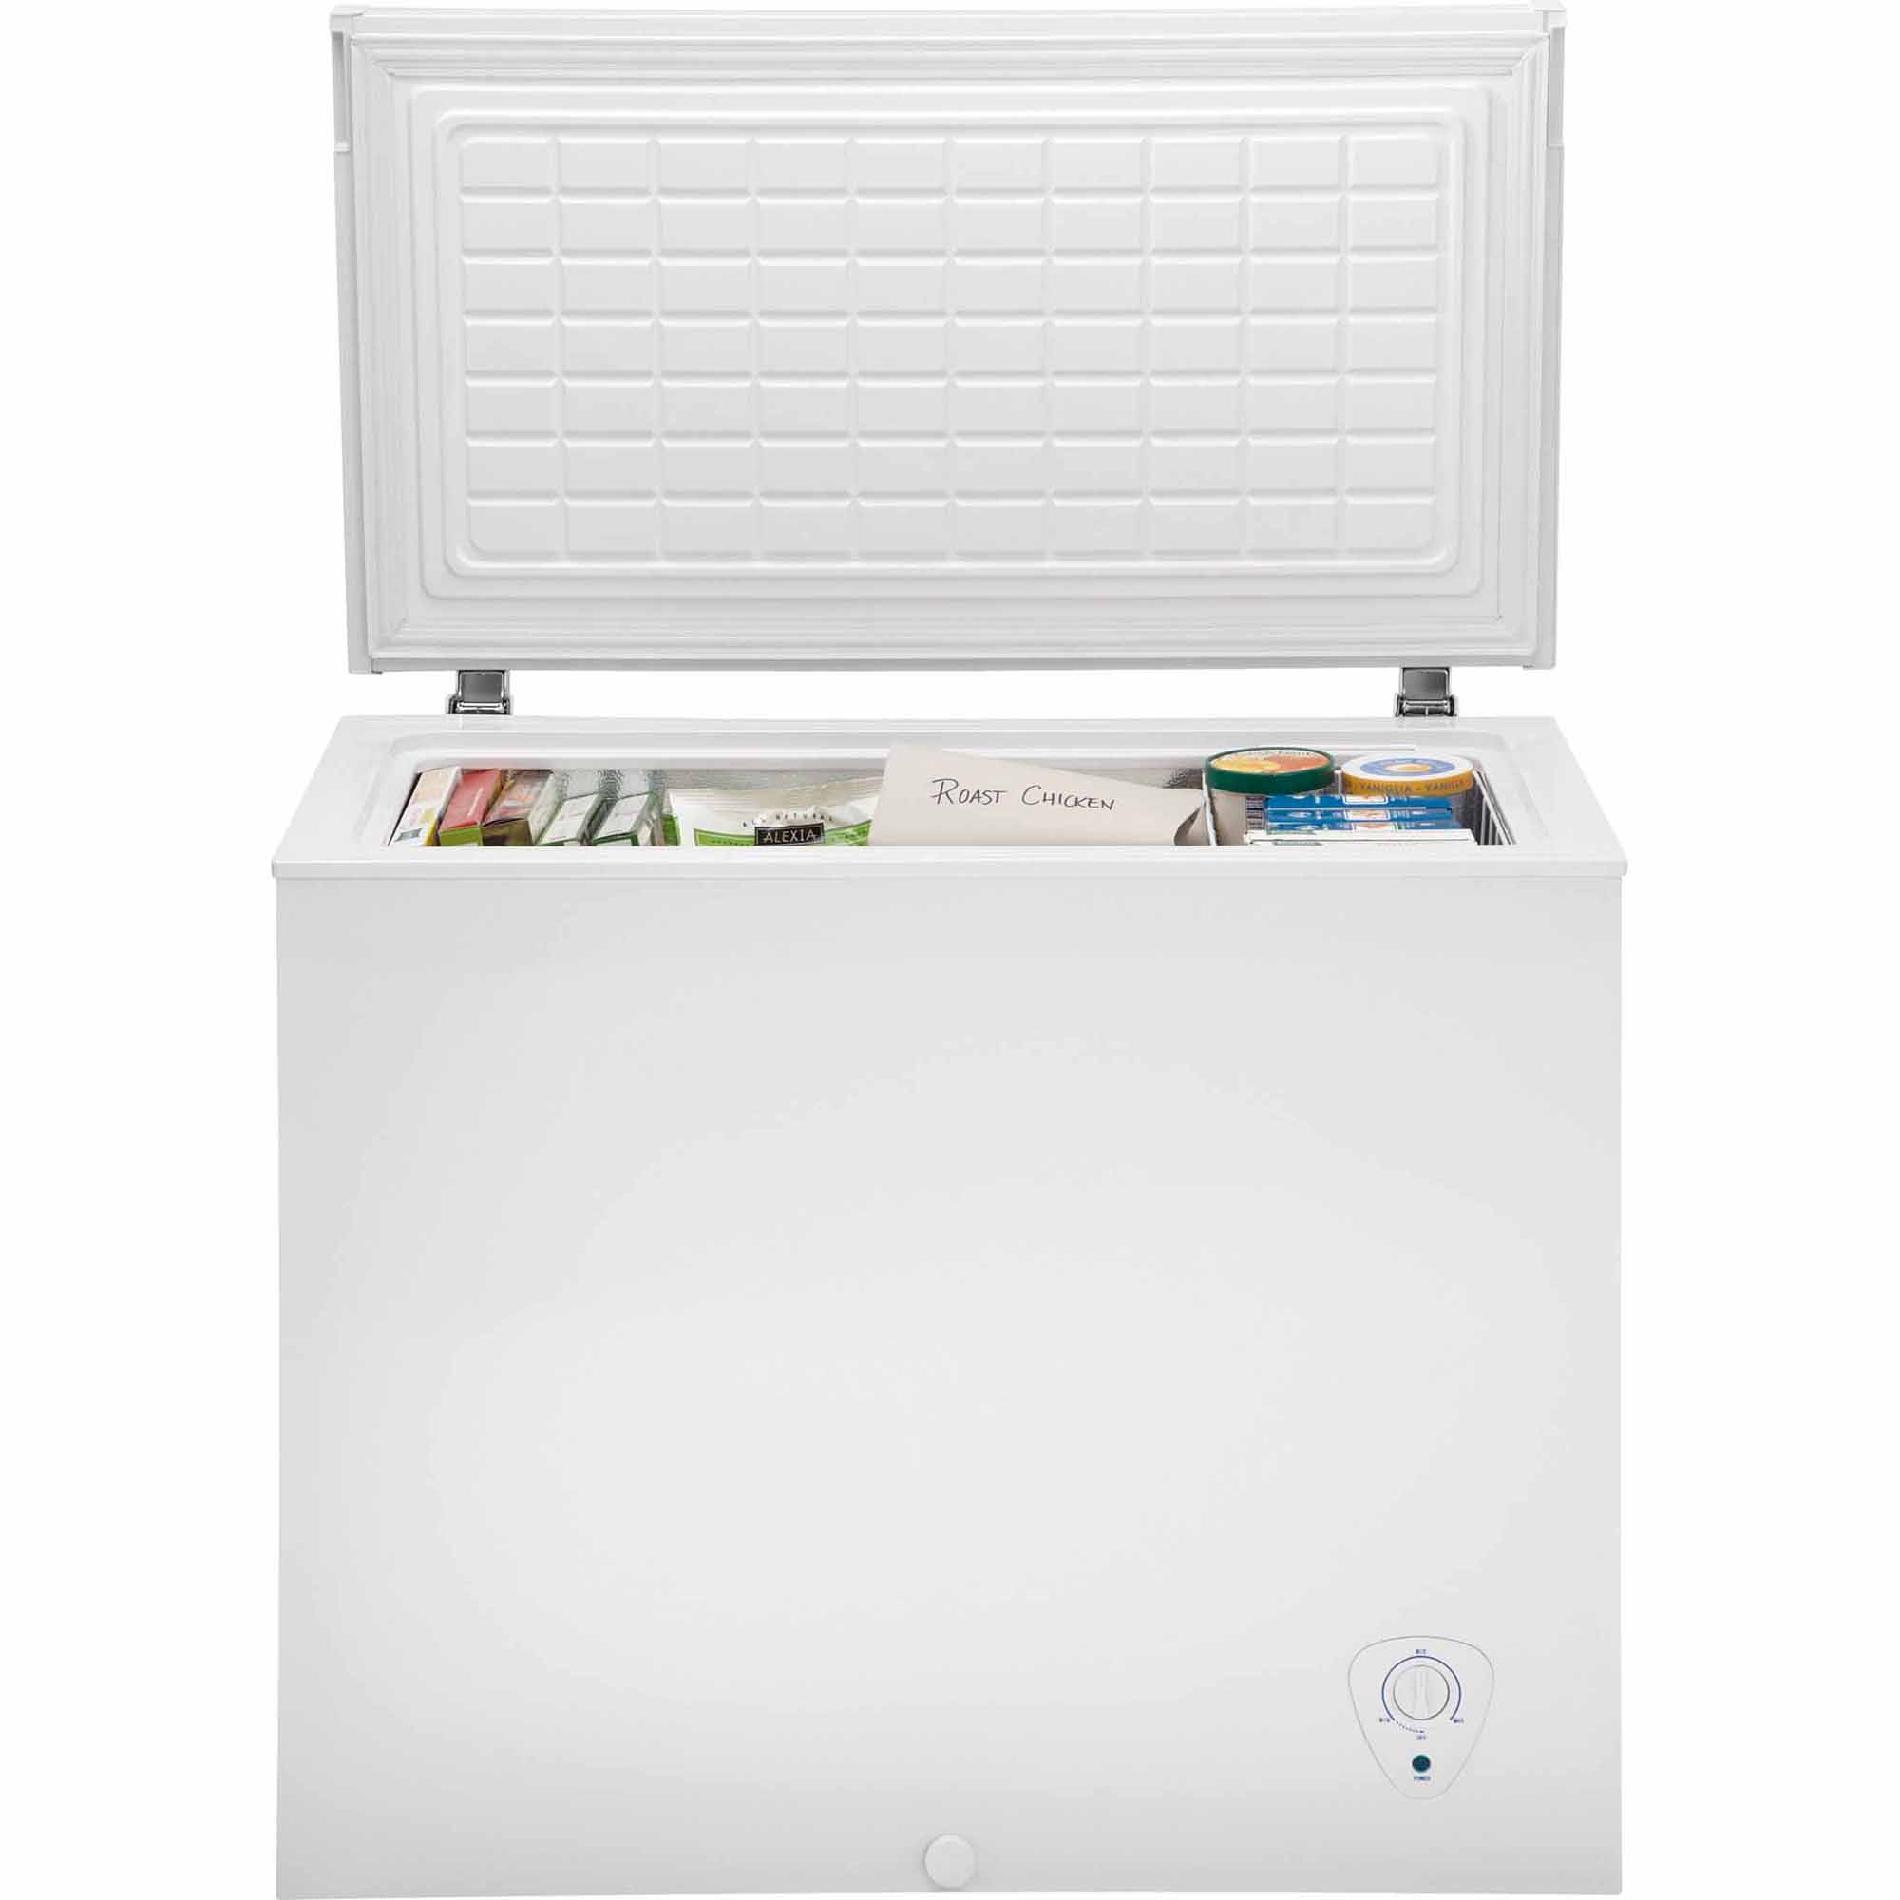 hight resolution of kenmore 12702 7 2 cu ft chest freezer whitekenmore freezer 8